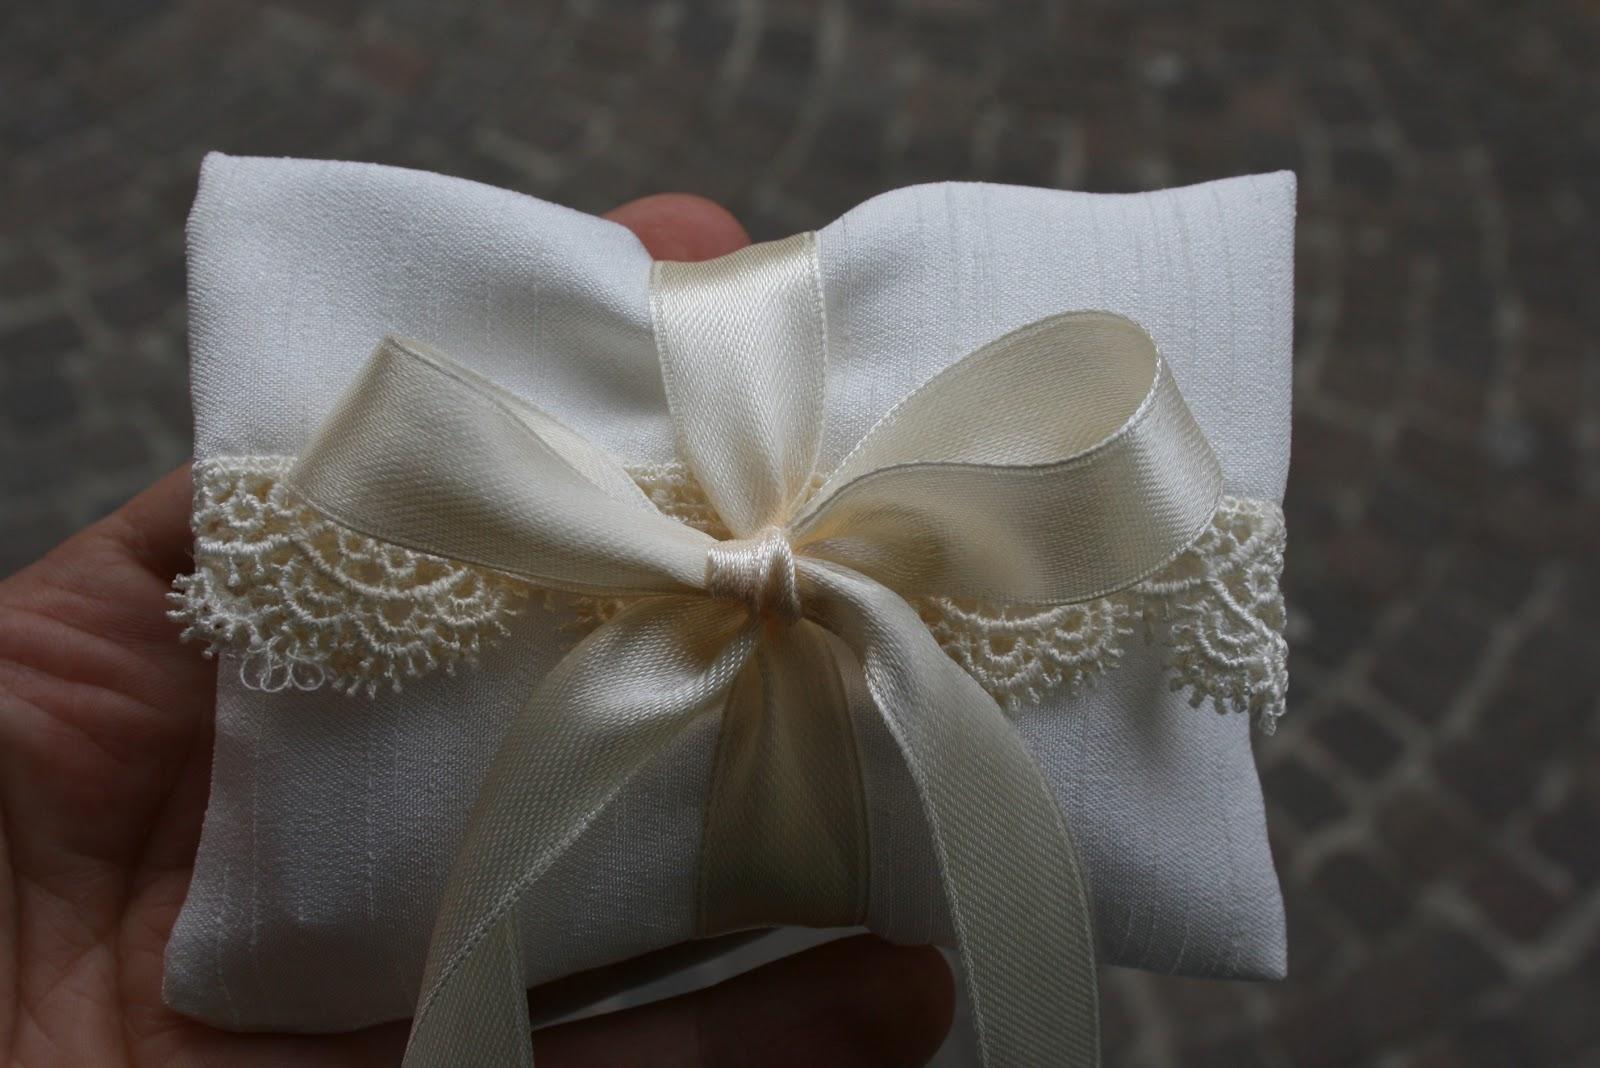 Bomboniere Matrimonio Toscana : Portaconfetti matrimonio tutte le offerte cascare a